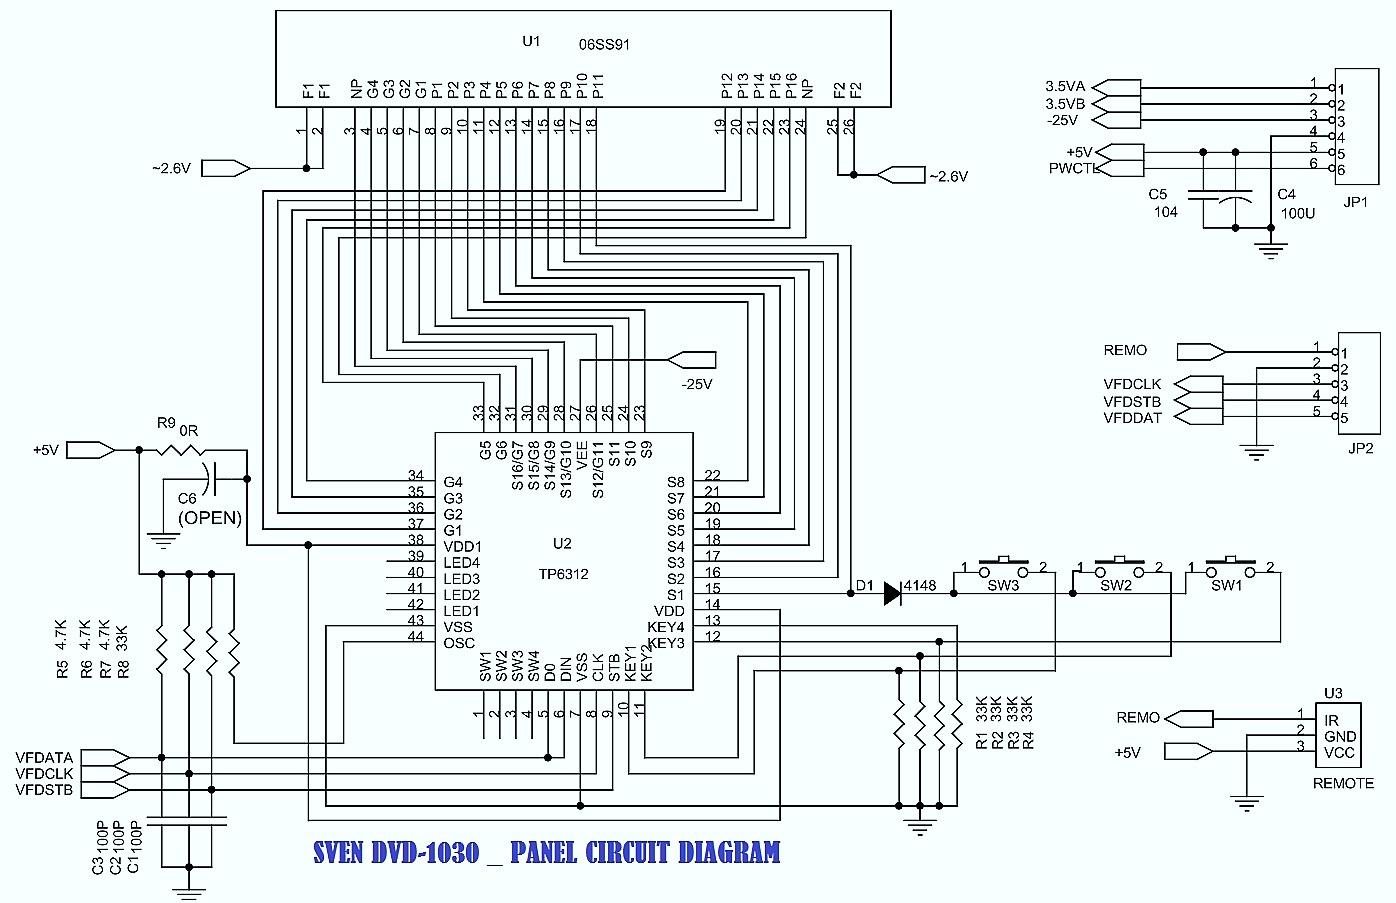 hight resolution of hyundai veloster wiring diagram circuit diagrams hyundai 2001 hyundai tiburon radio wiring diagram hyundai tiburon radio